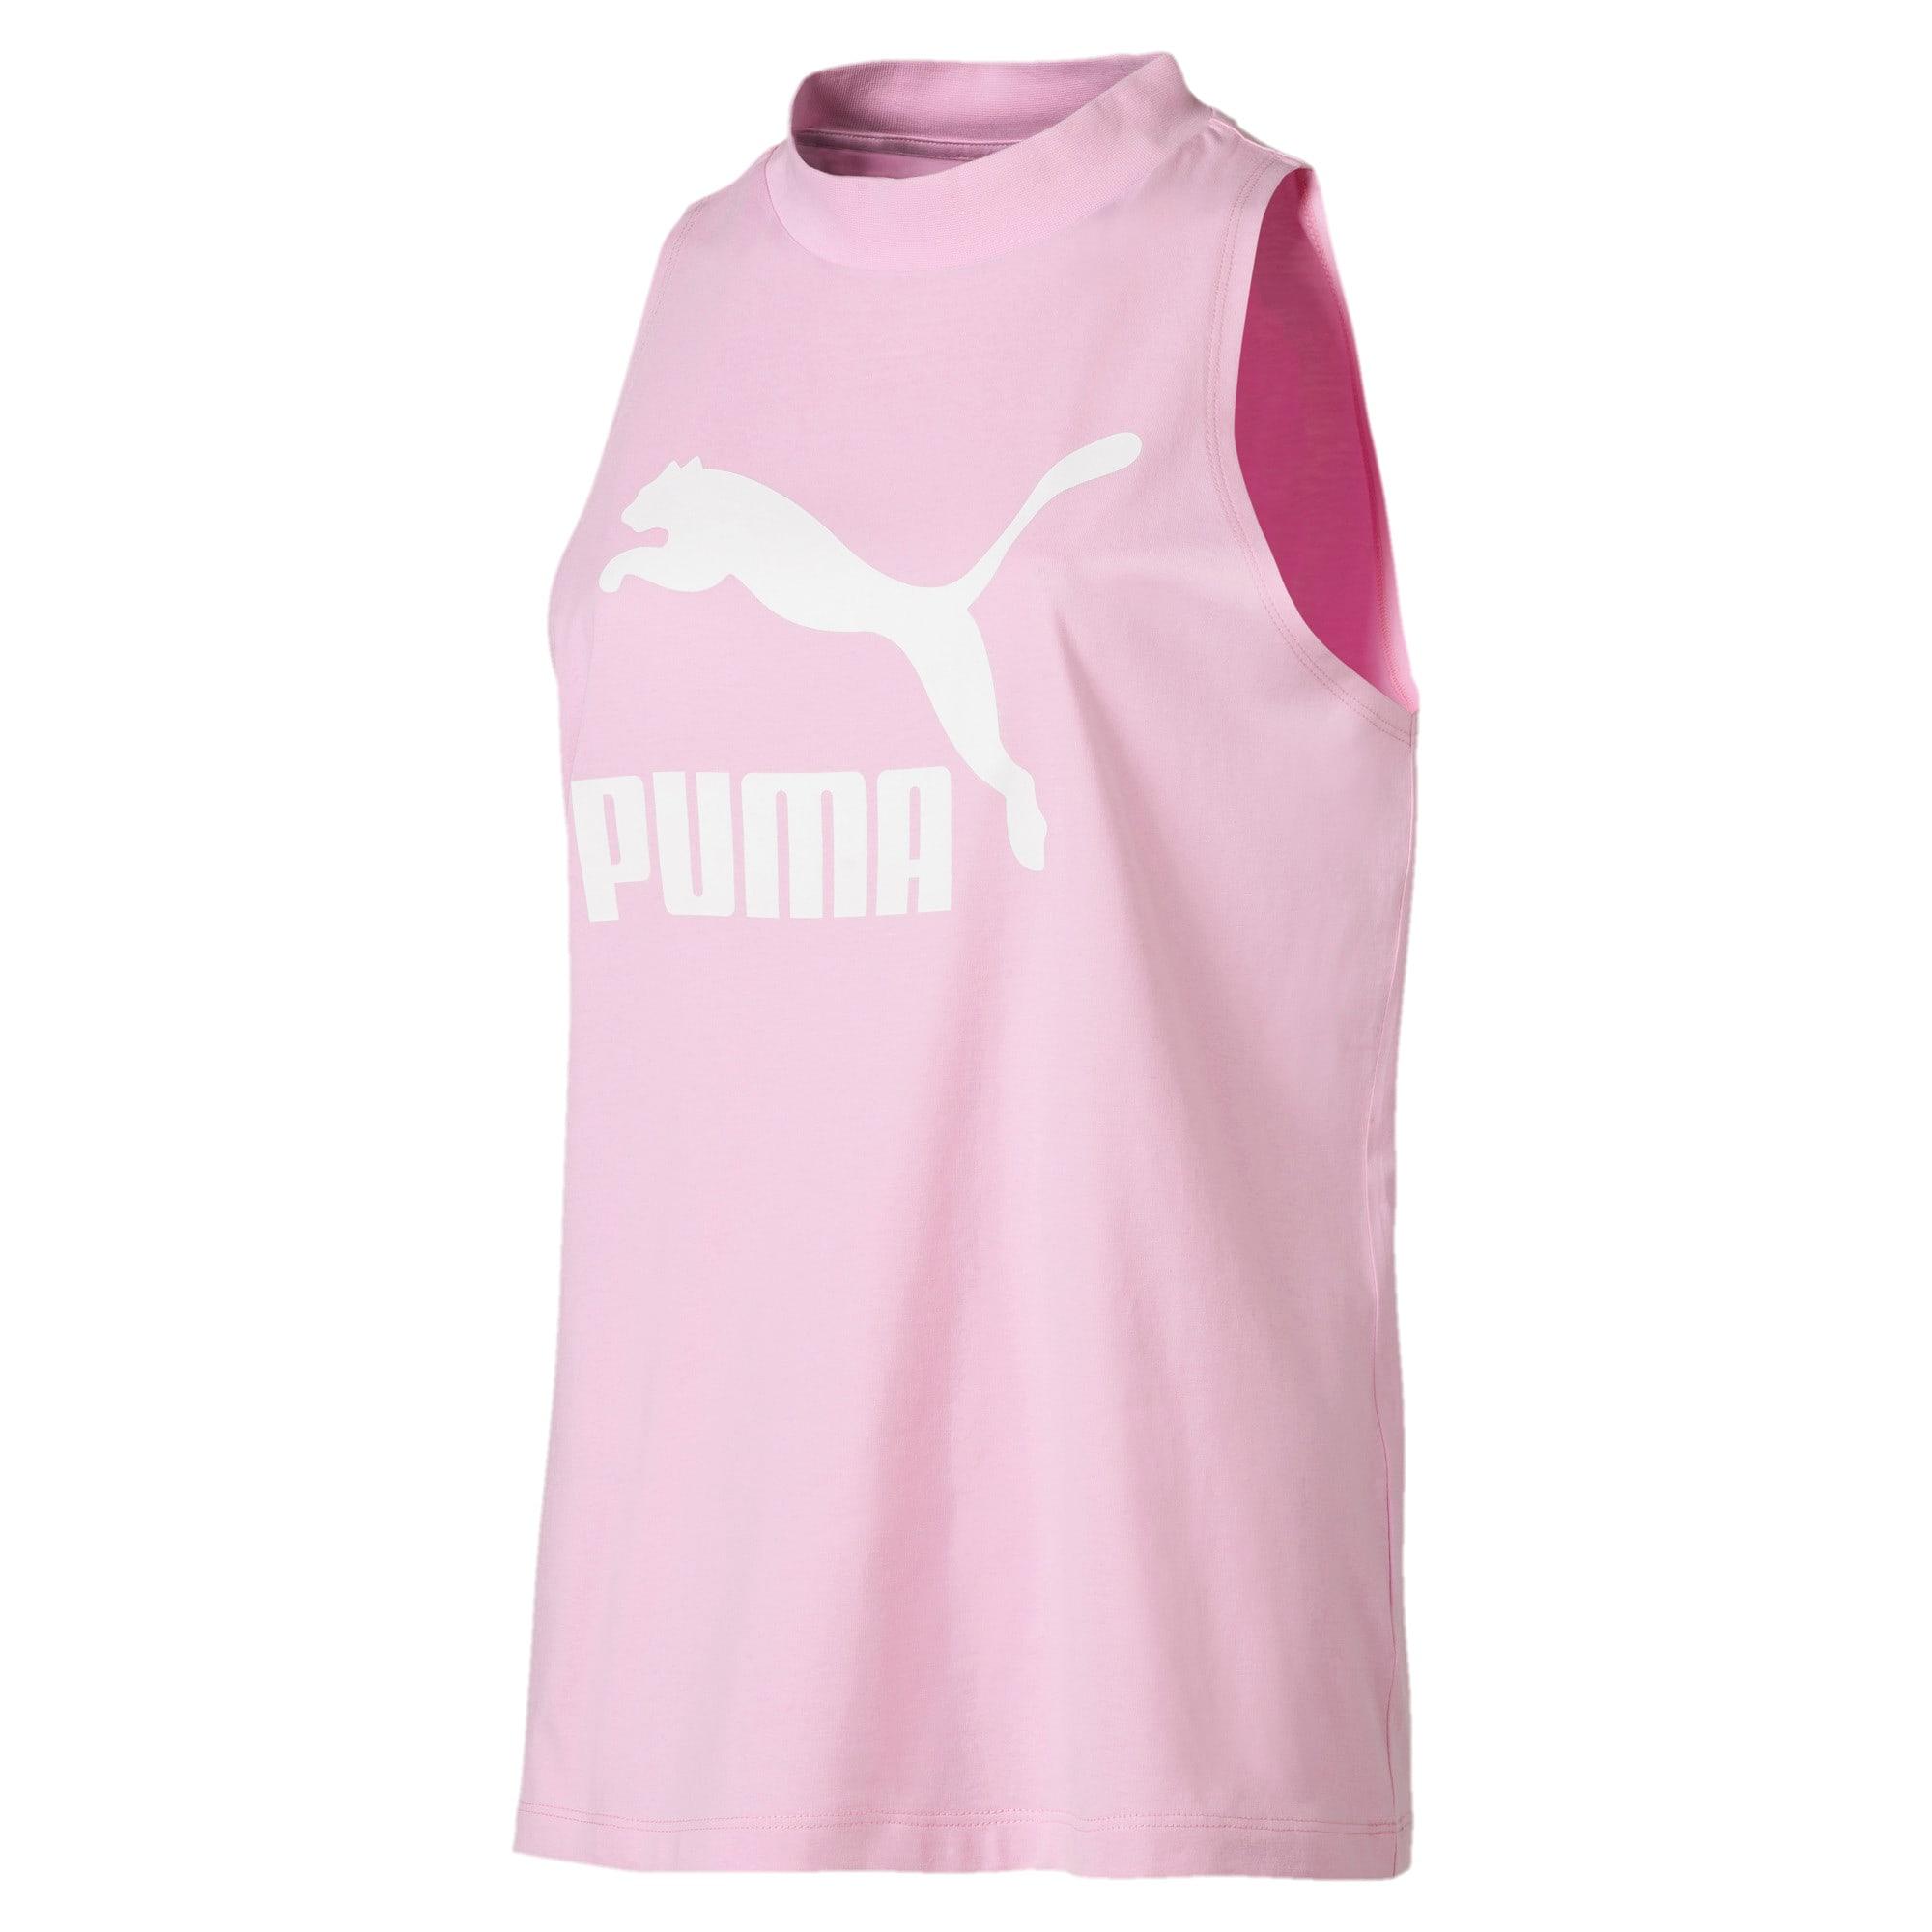 Thumbnail 1 of Classics Logo Women's Tank, Pale Pink, medium